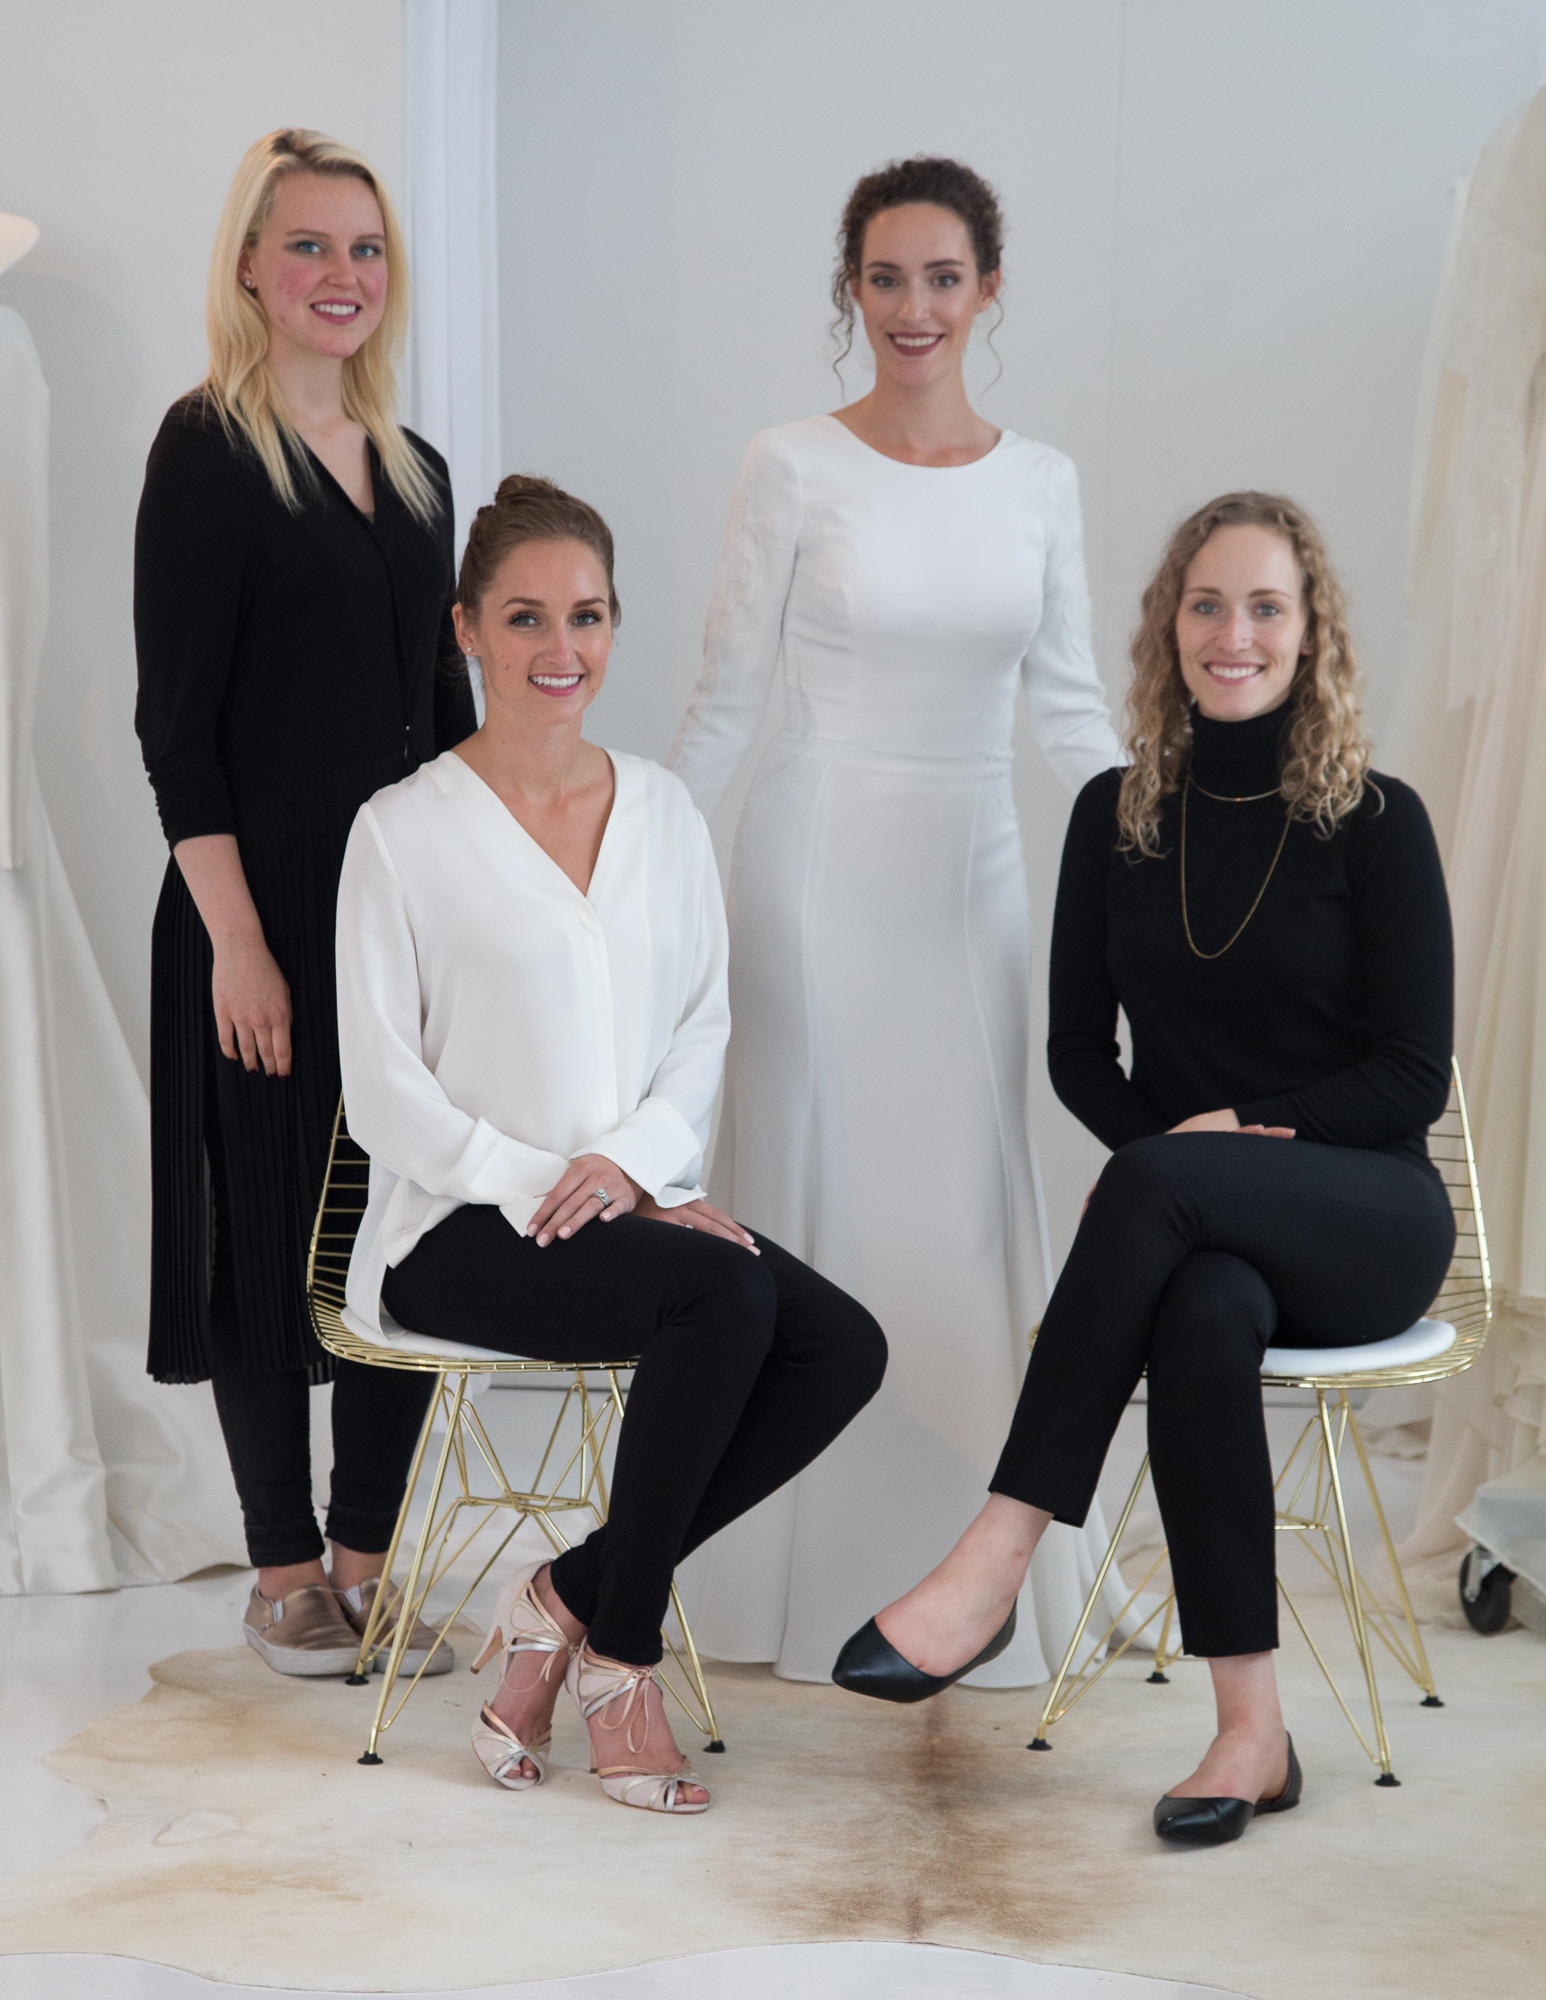 Wedding Dress Shop | Wedding Dress Maker | MN Bridal Shop